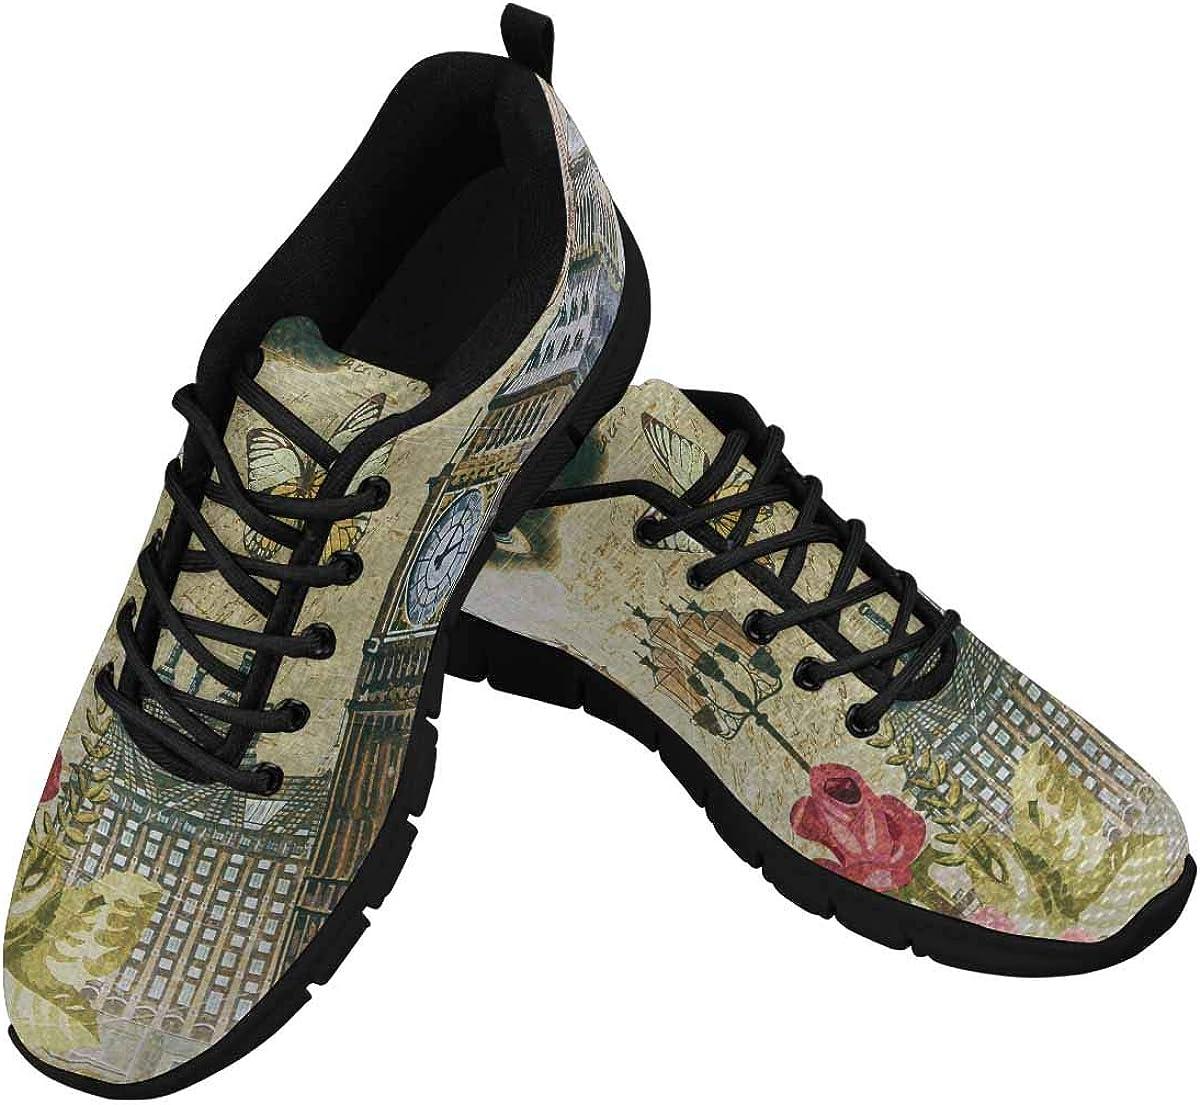 INTERESTPRINT London Big Ben Vintage Poster Women's Lace Up Running Comfort Sports Sneakers